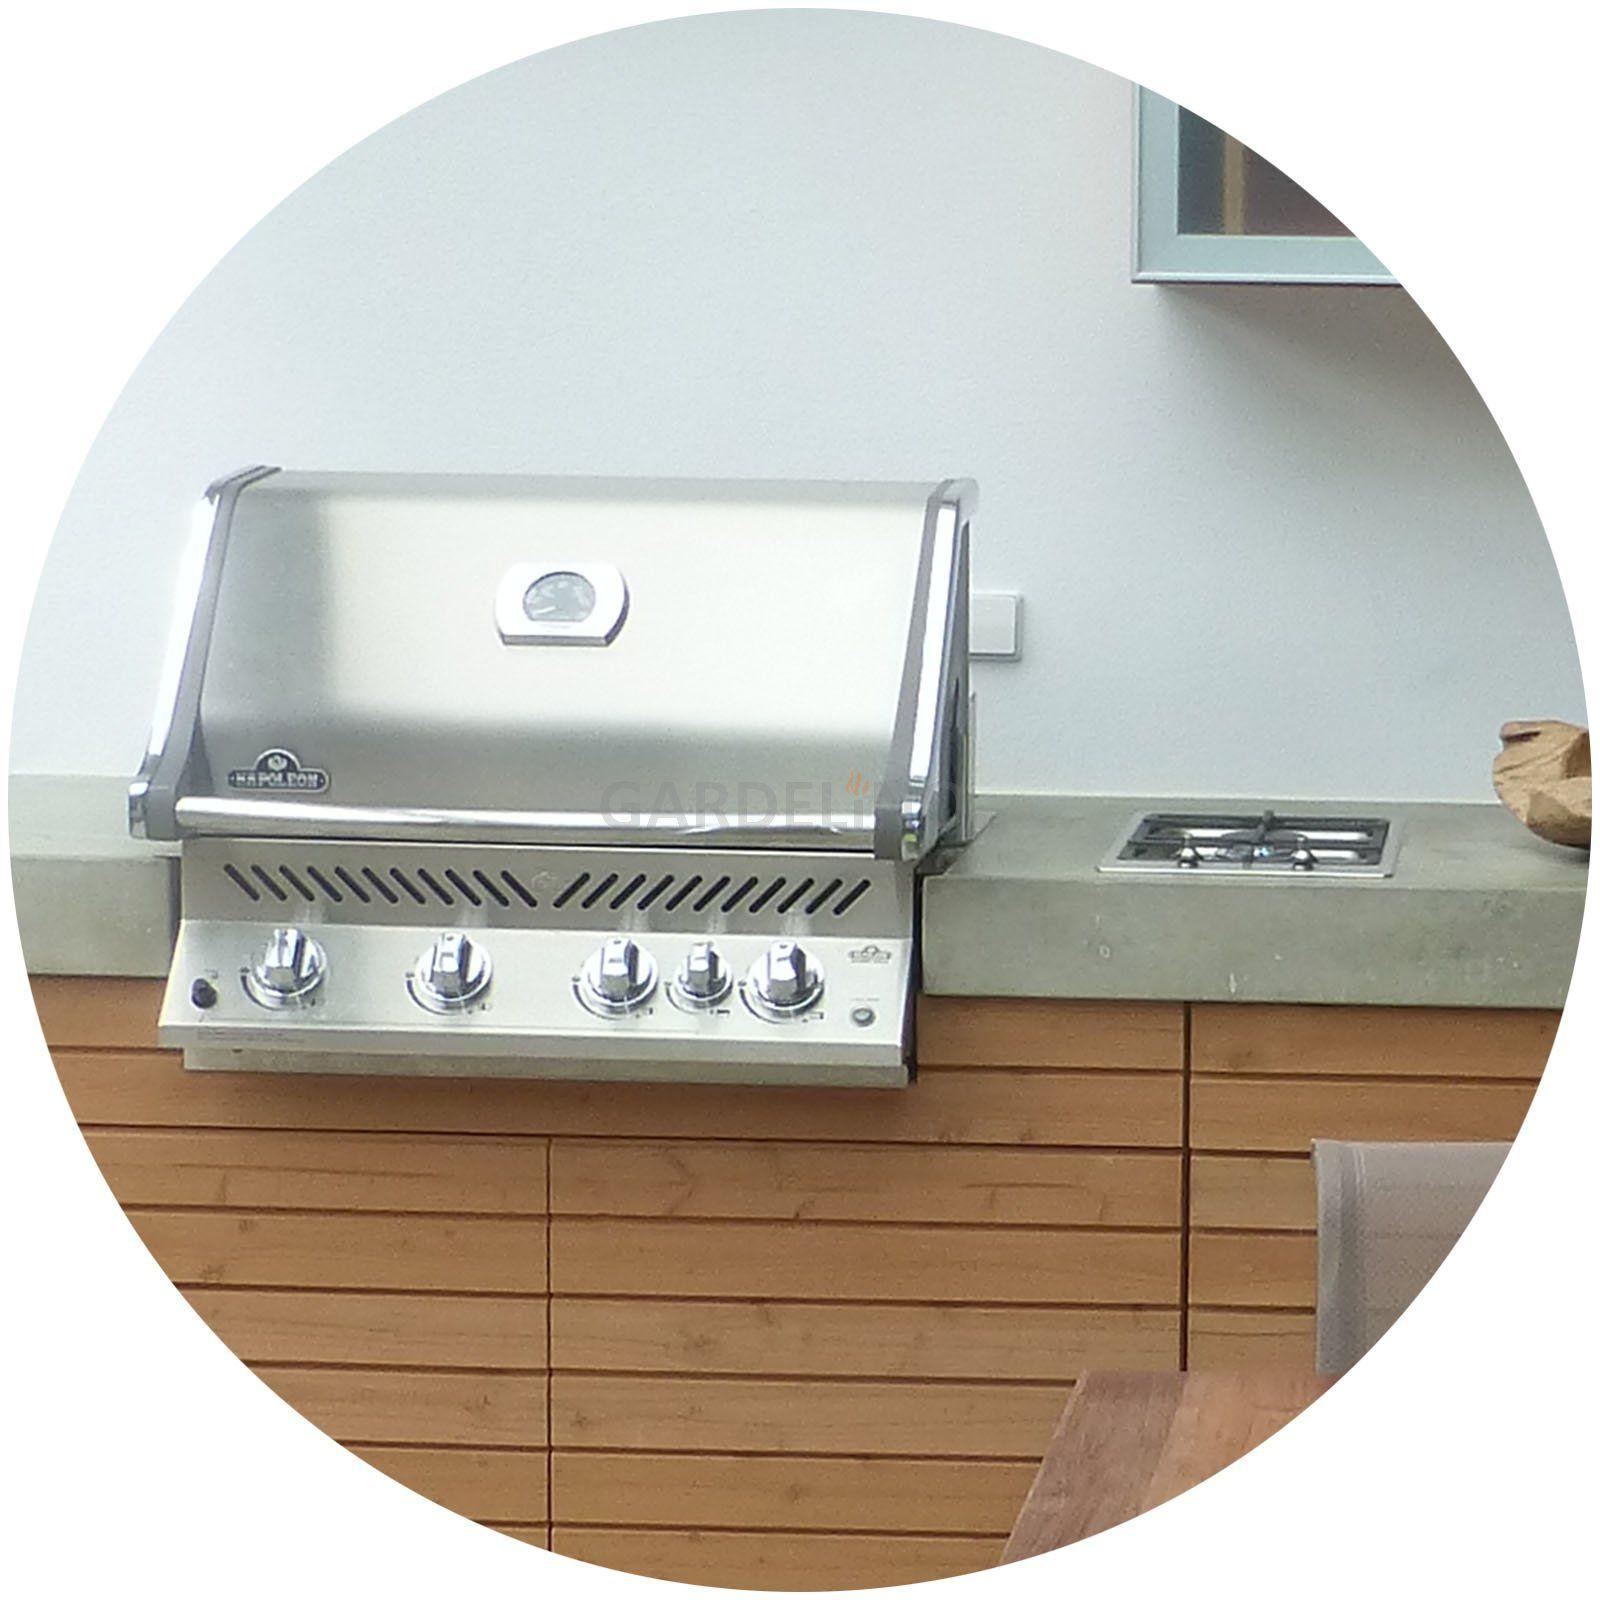 Küchenschränke-kits jaqueline jungk jackie on pinterest